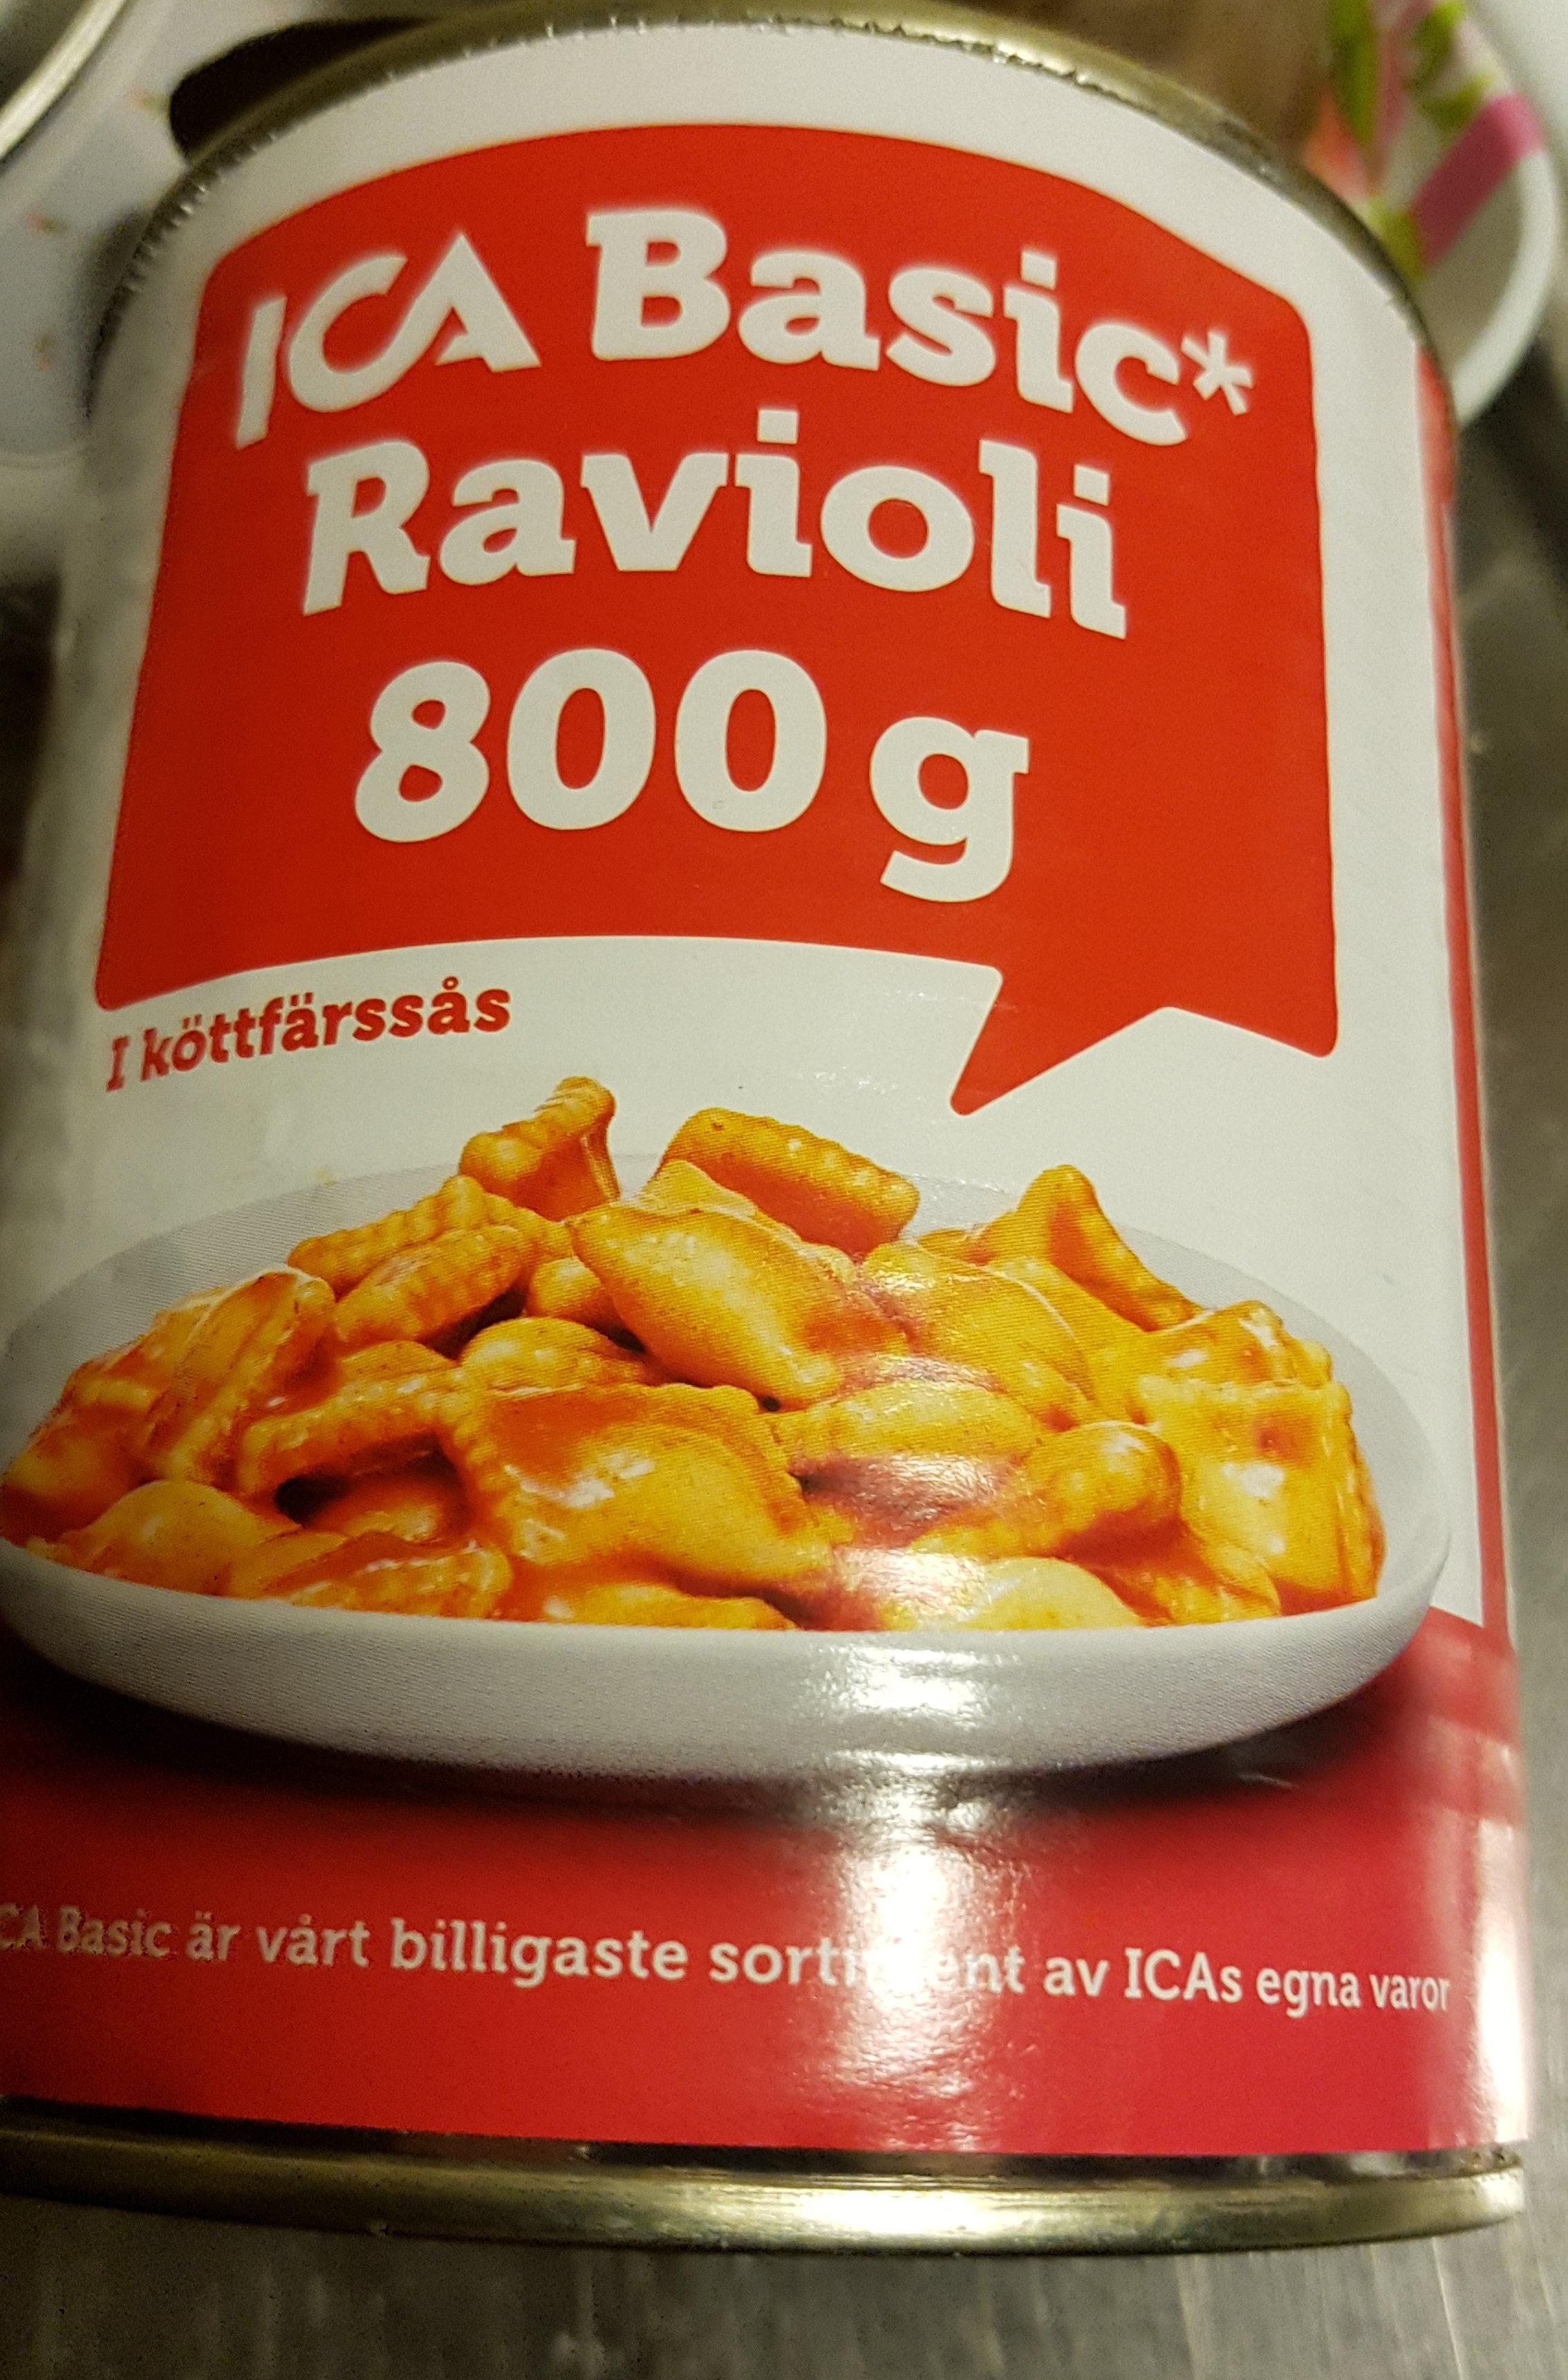 ica Basic ravioli - Informations nutritionnelles - de